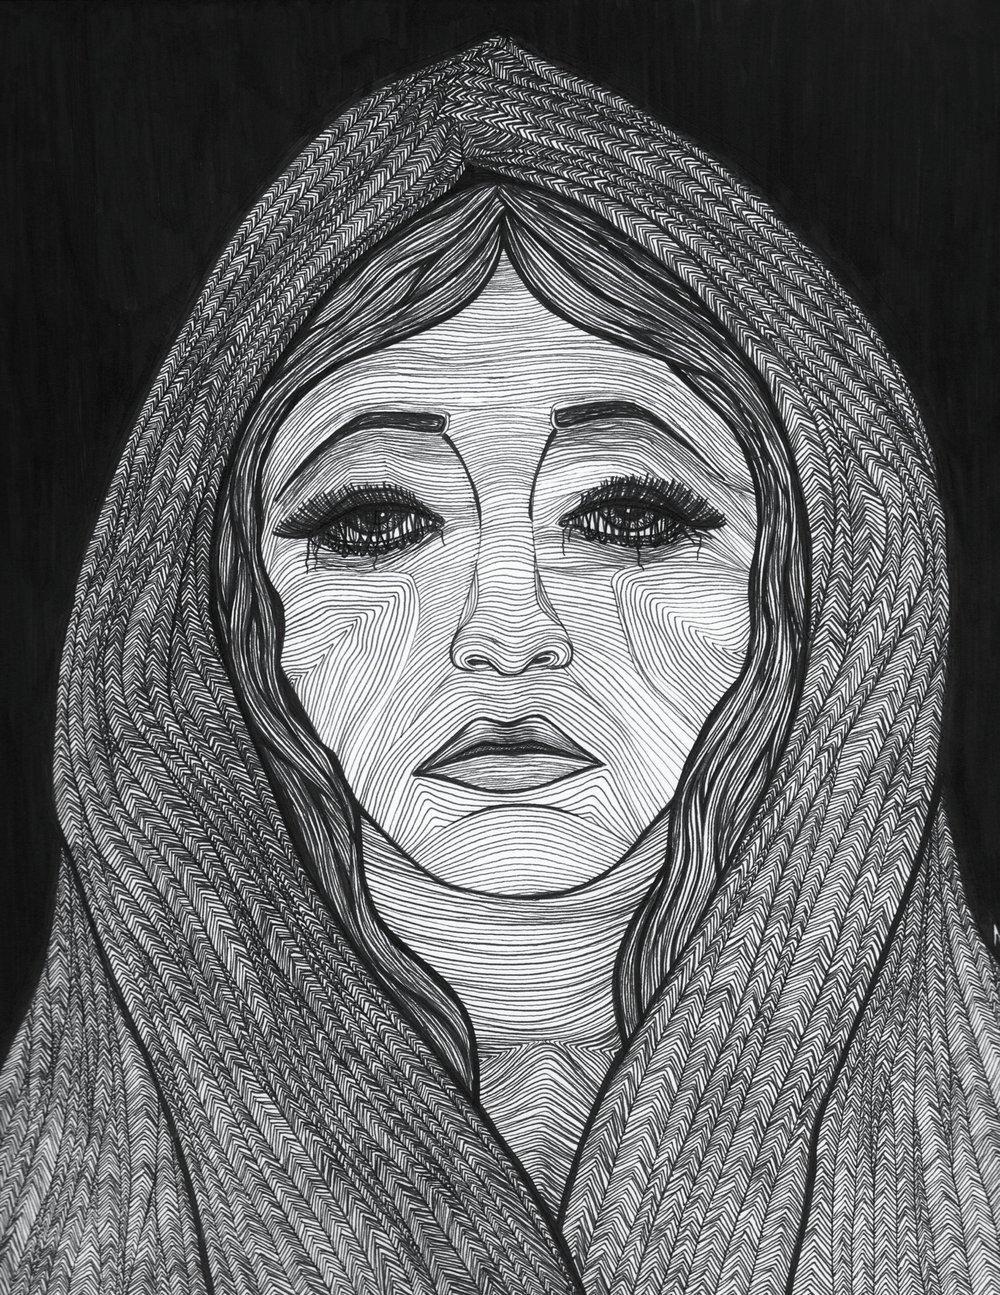 Envy, Pen on Paper, 2013